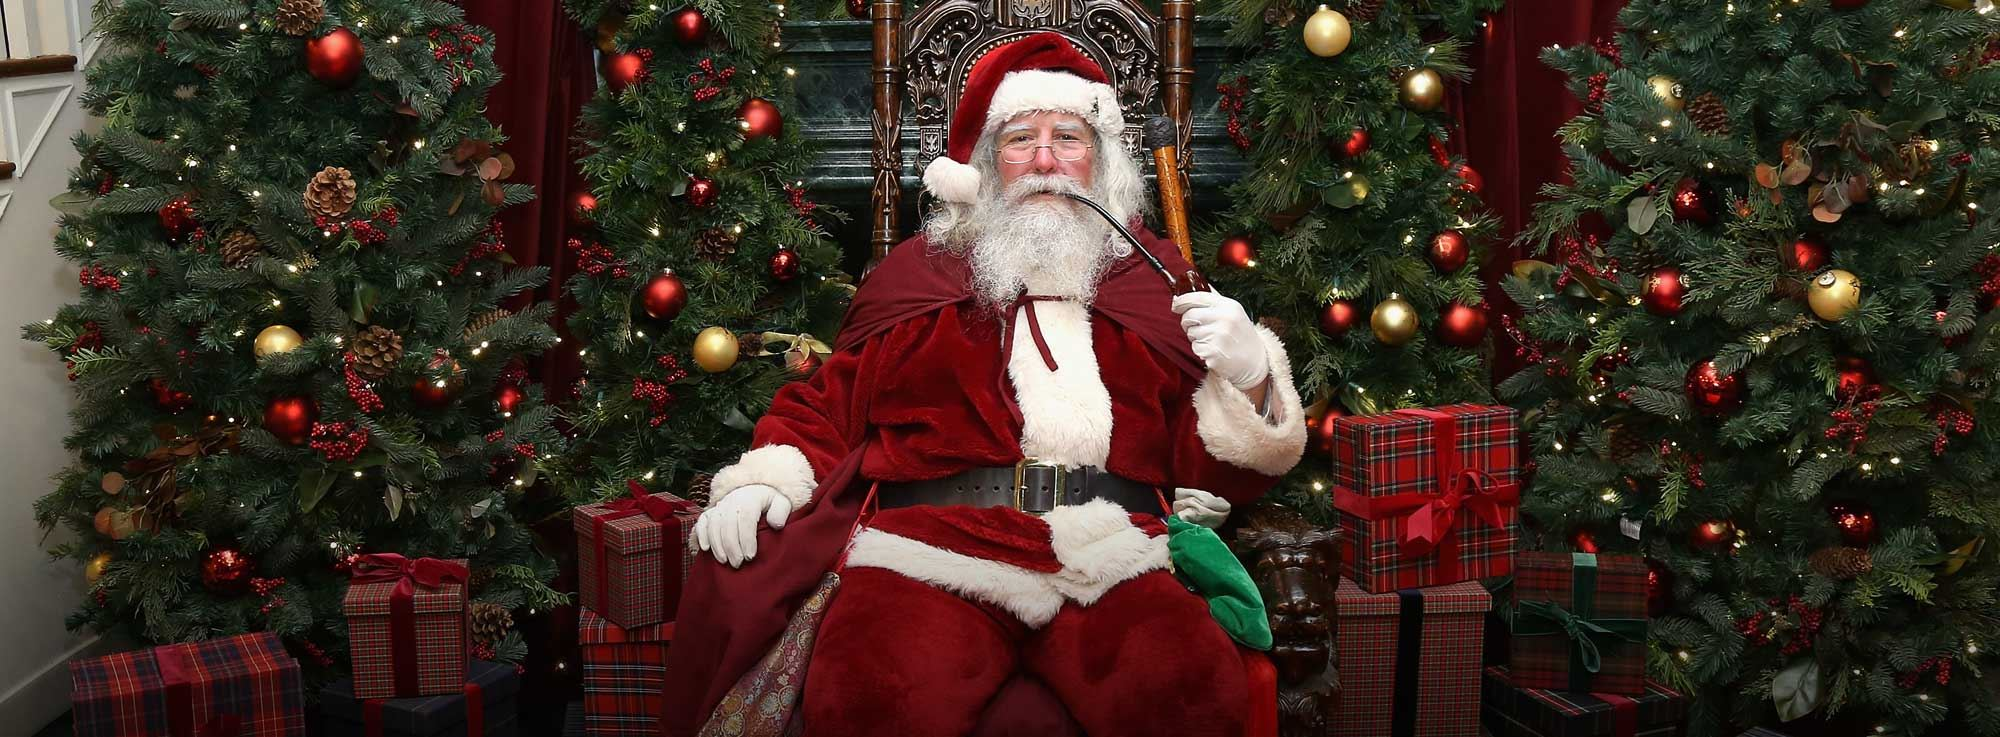 Roseto Valfortore: Natale 2017 - La fabbrica degli Elfi